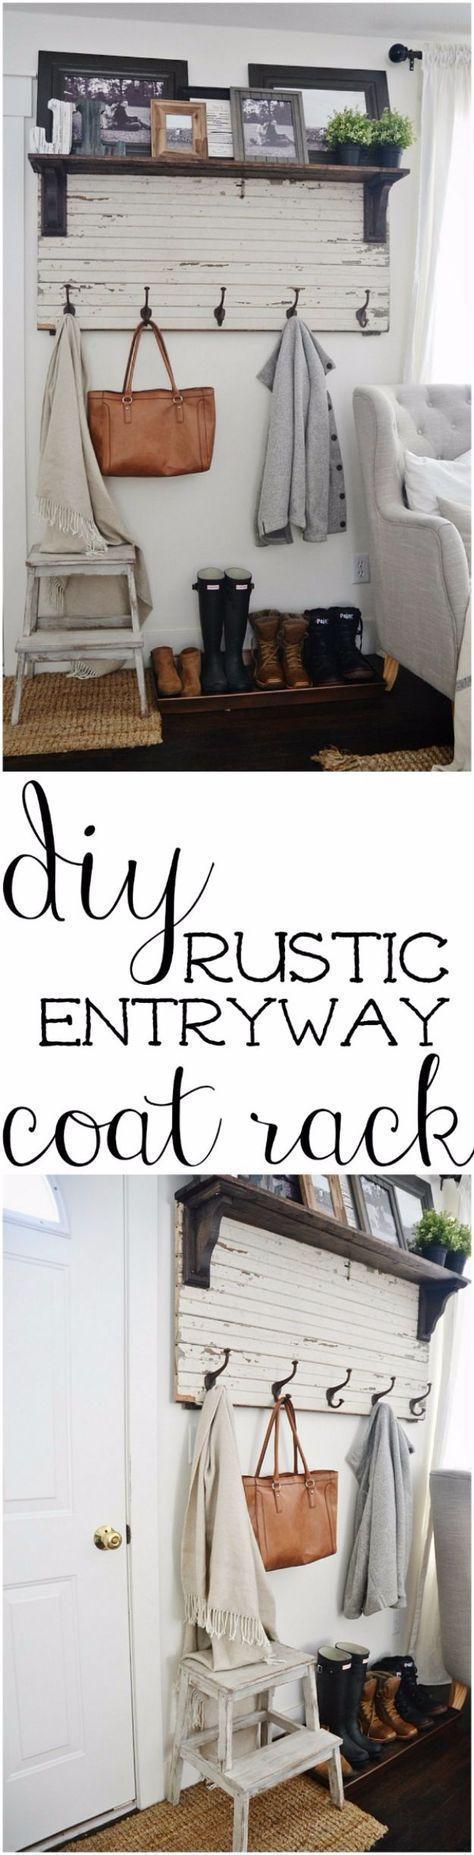 Photo of Best Country Decor Ideas – DIY Rustic Entryway Coat Rack – Rustic Farmhouse Deco…